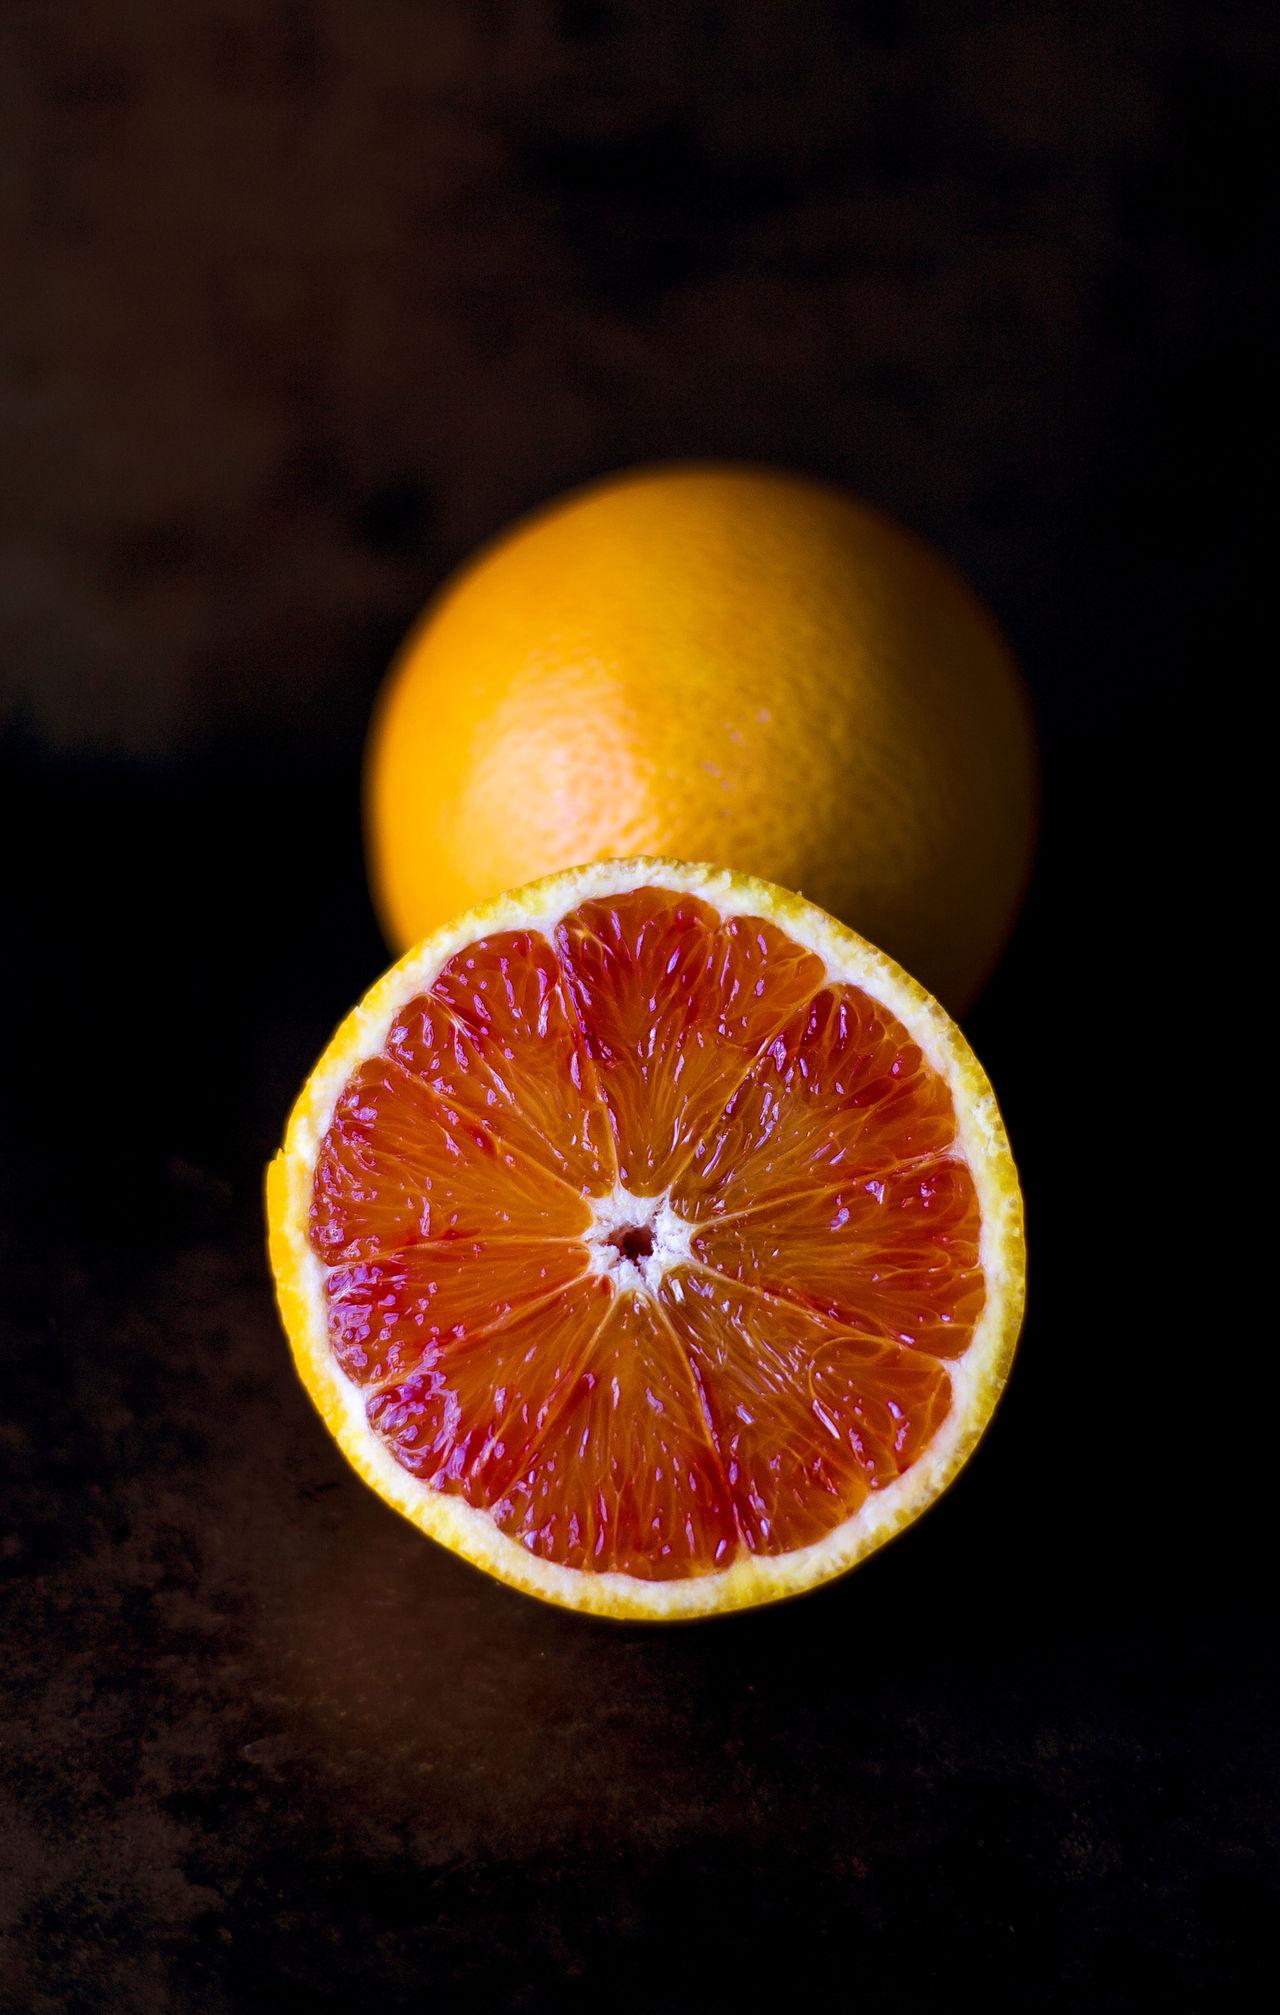 Black Background Blood Orange Citrus Fruit Close-up Cross Section Food Food And Drink Freshness Fruit Grapefruit Halved Healthy Eating Healthy Lifestyle Indoors  Juicy No People Orange - Fruit SLICE Sour Taste Squeezing Studio Shot Vitamin Yellow